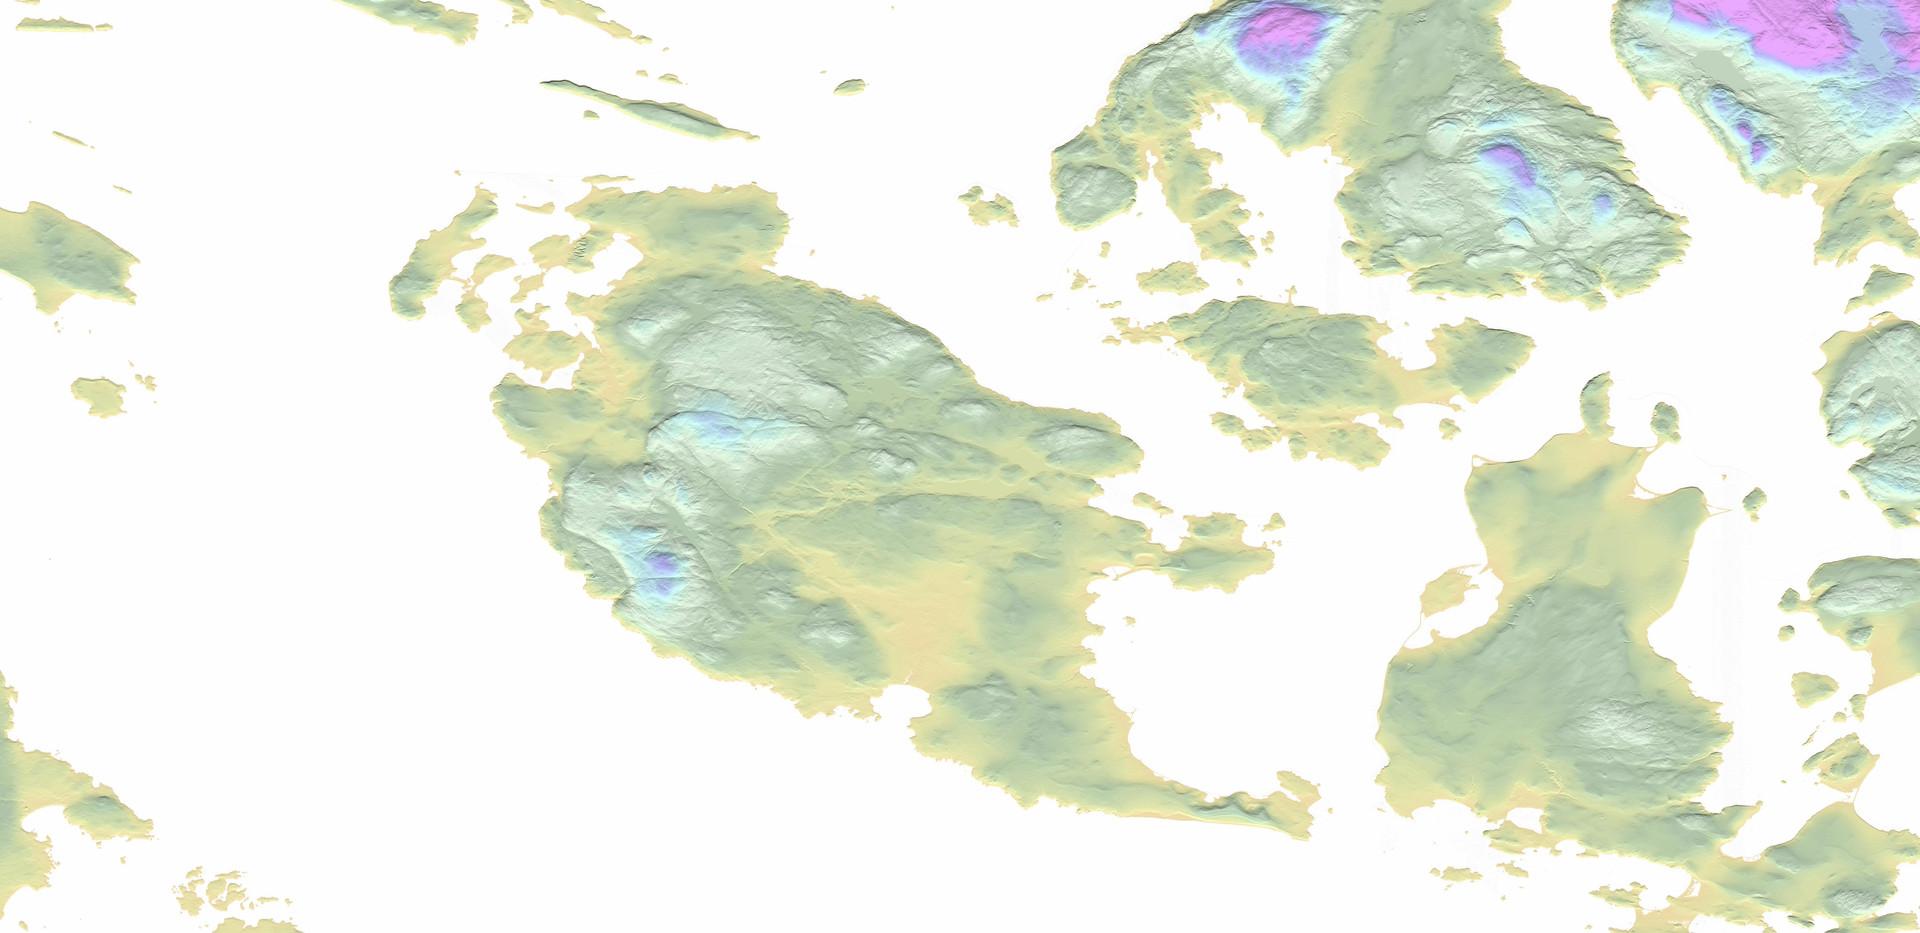 sji topography